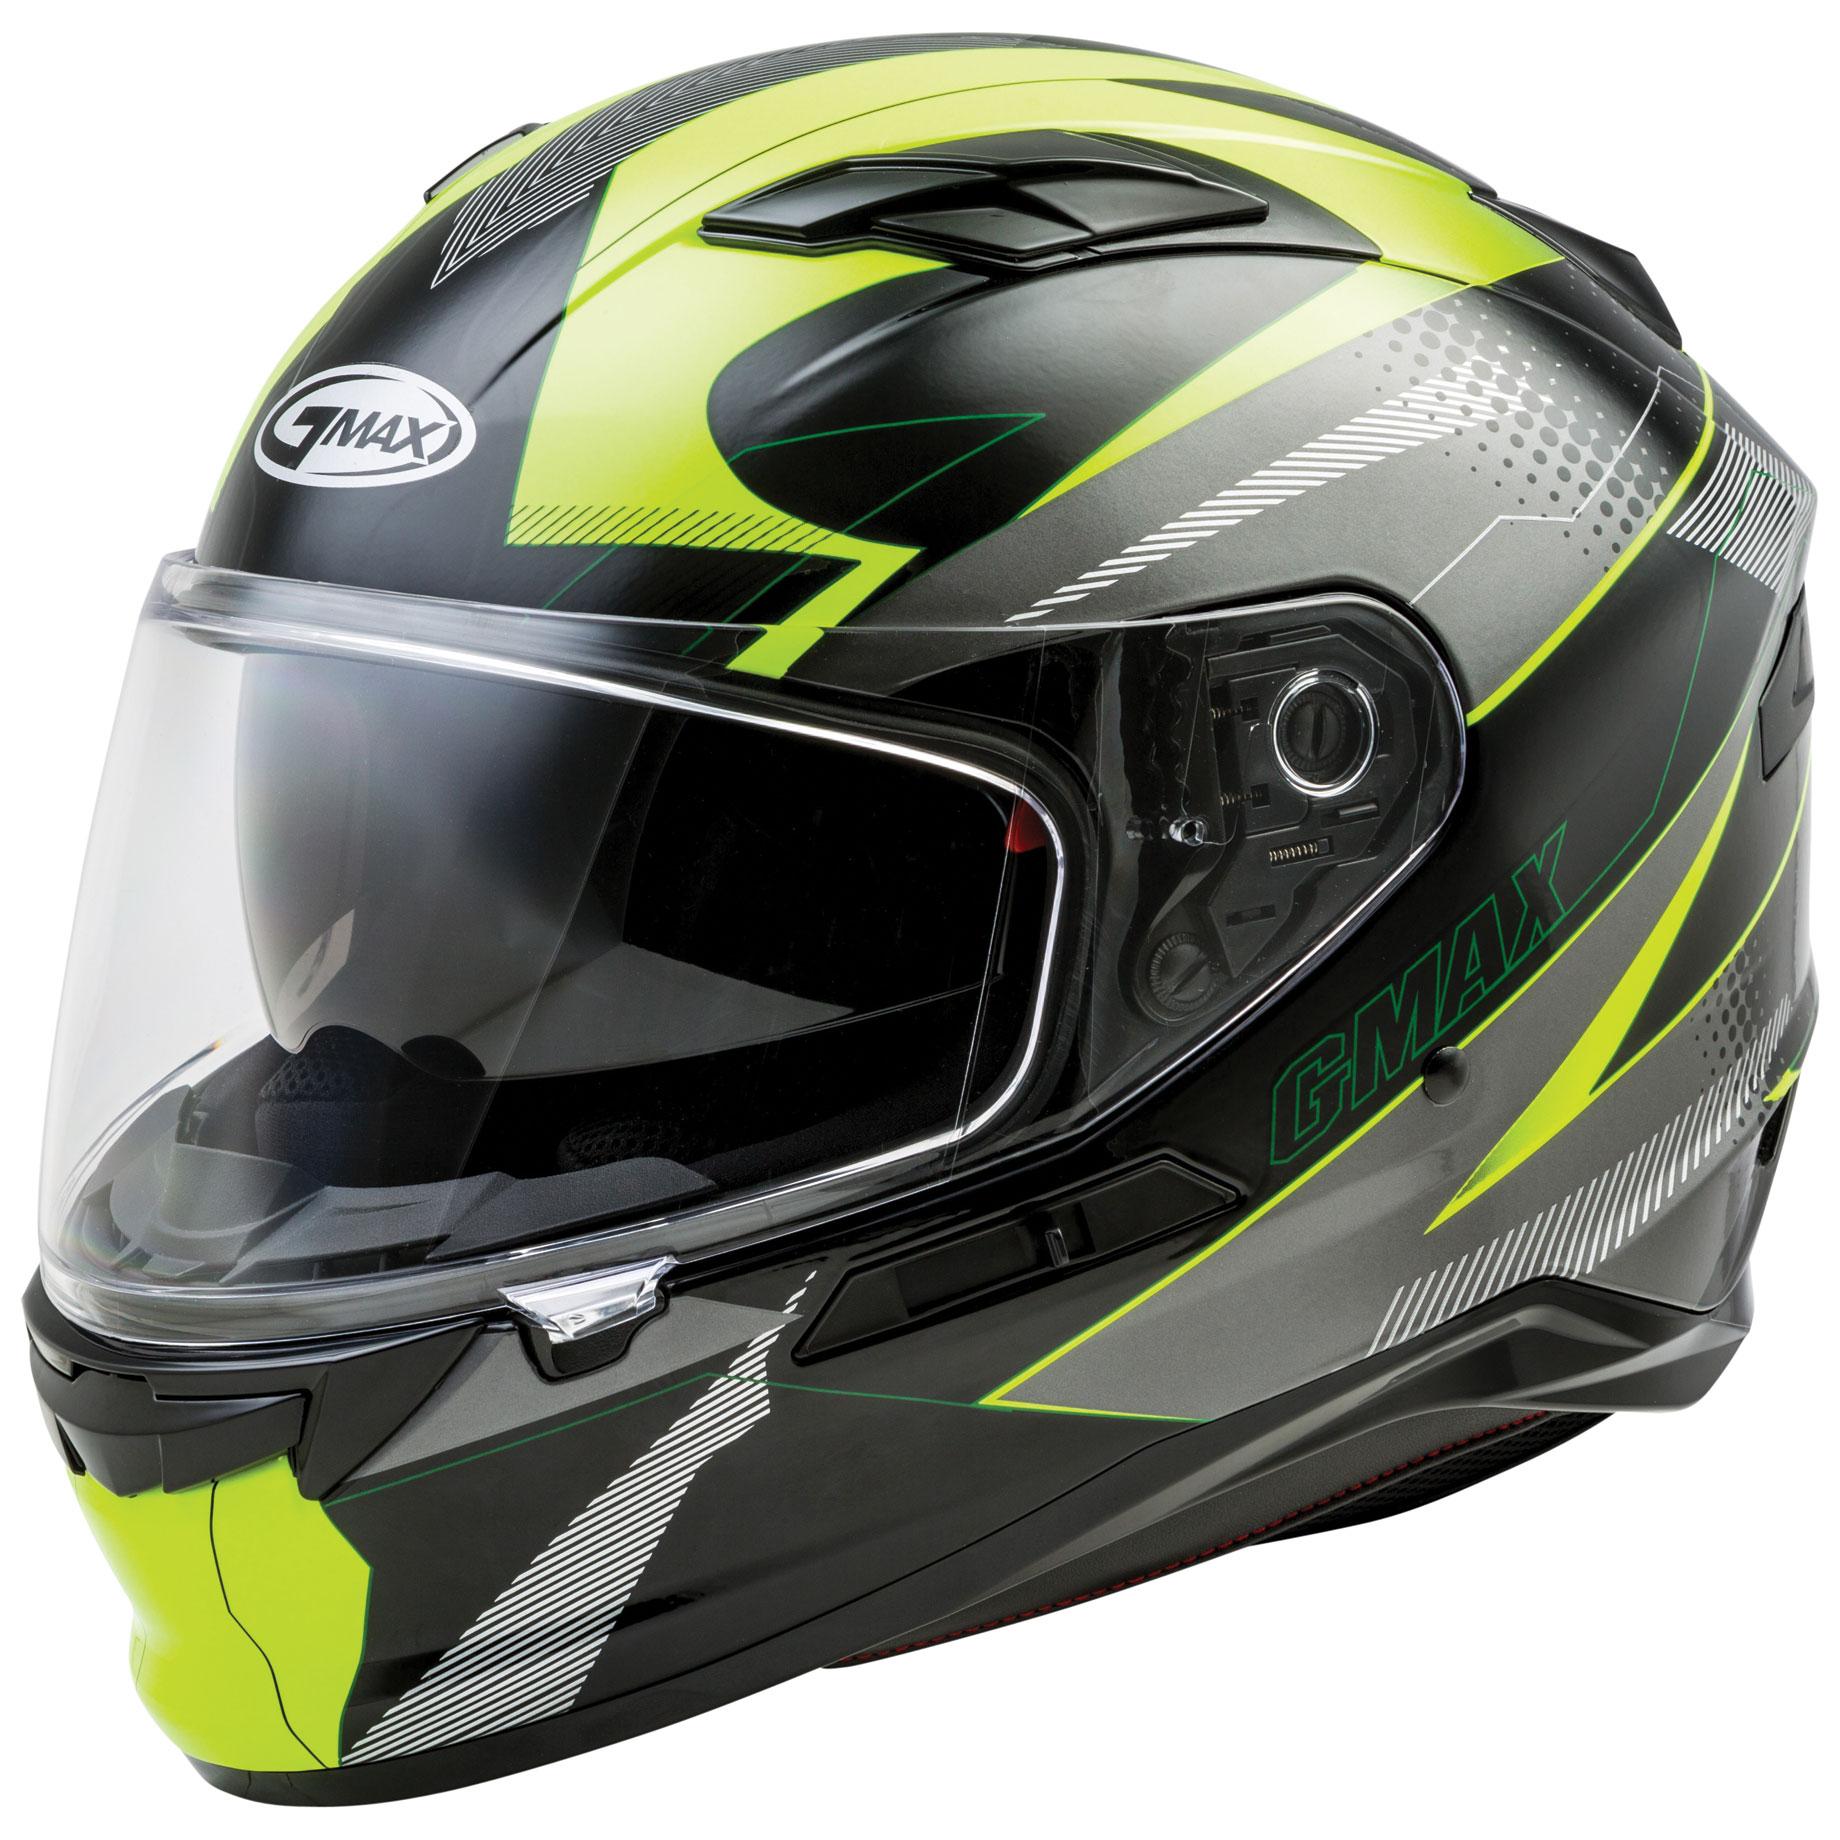 GMAX FF98 Apex Black/Hi-Viz Full Face Helmet